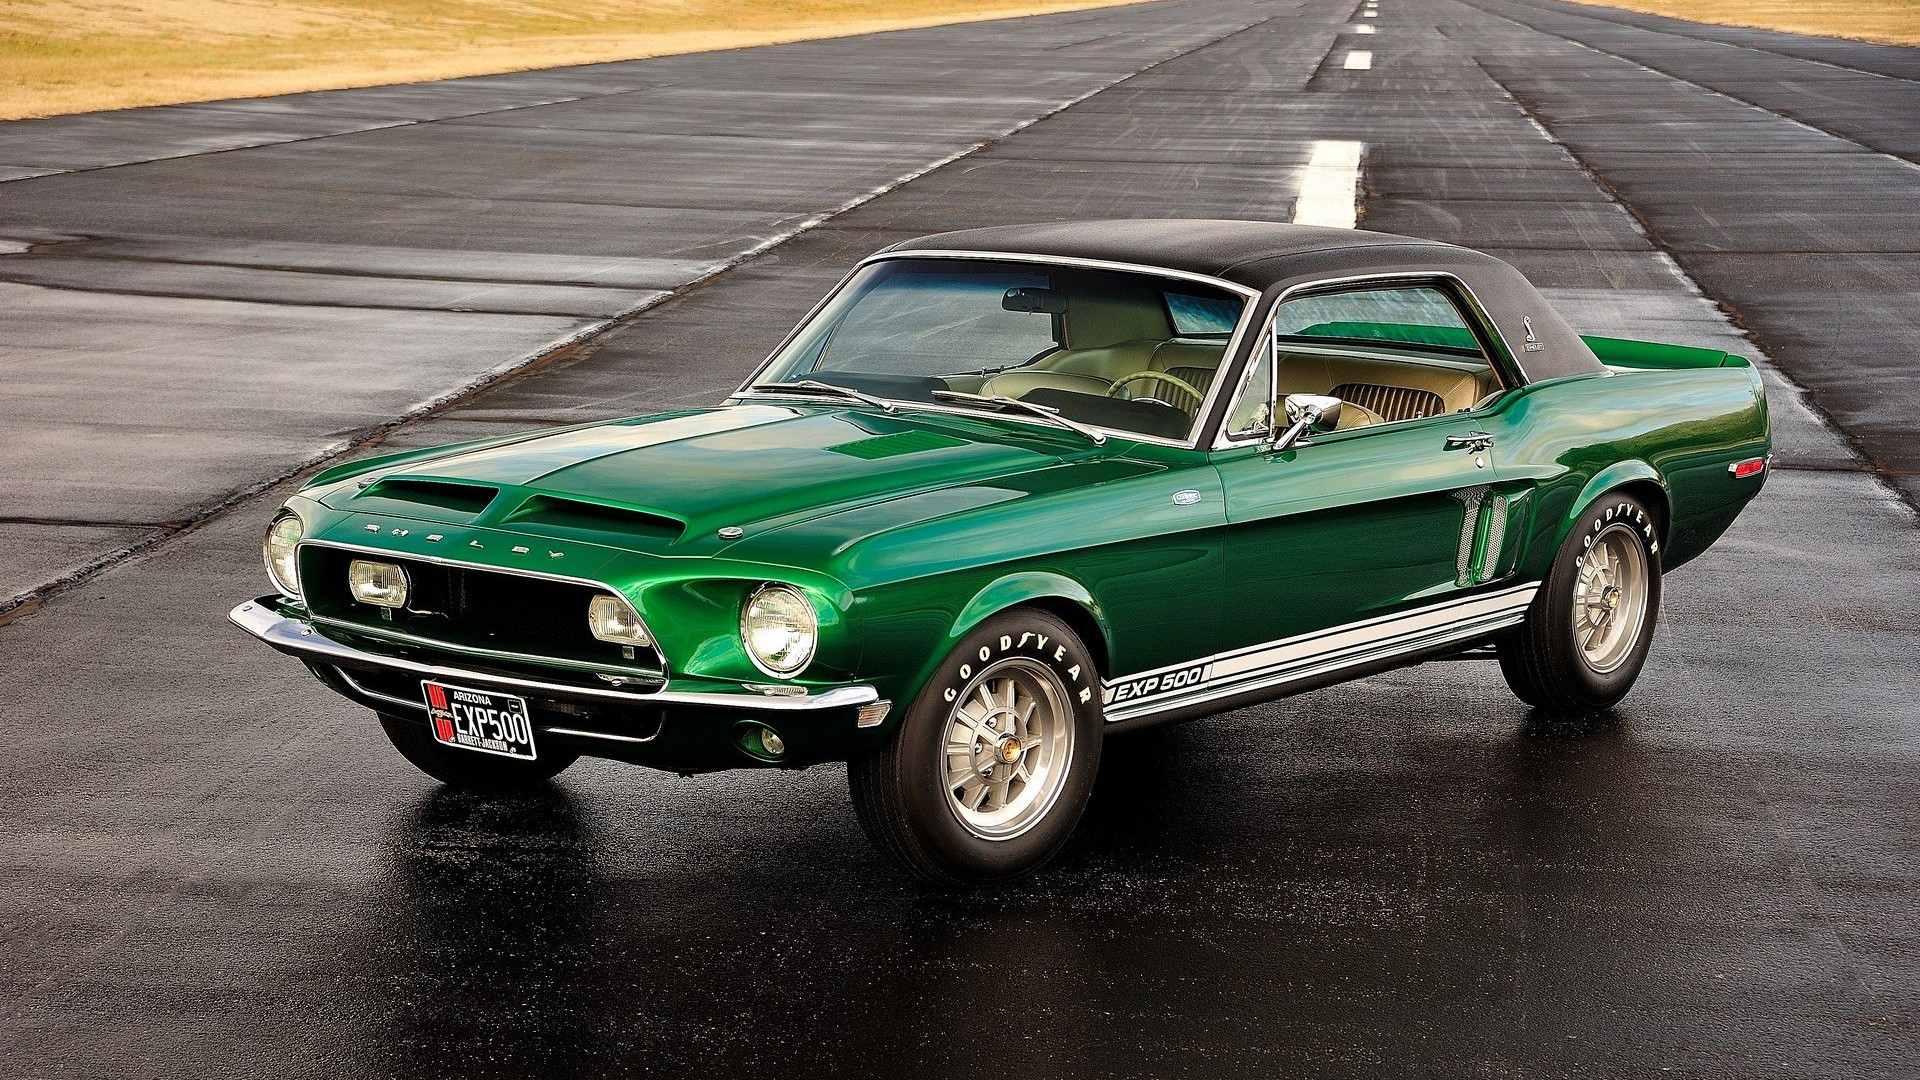 1968 Shelby GT500 Green Hornet Prototype